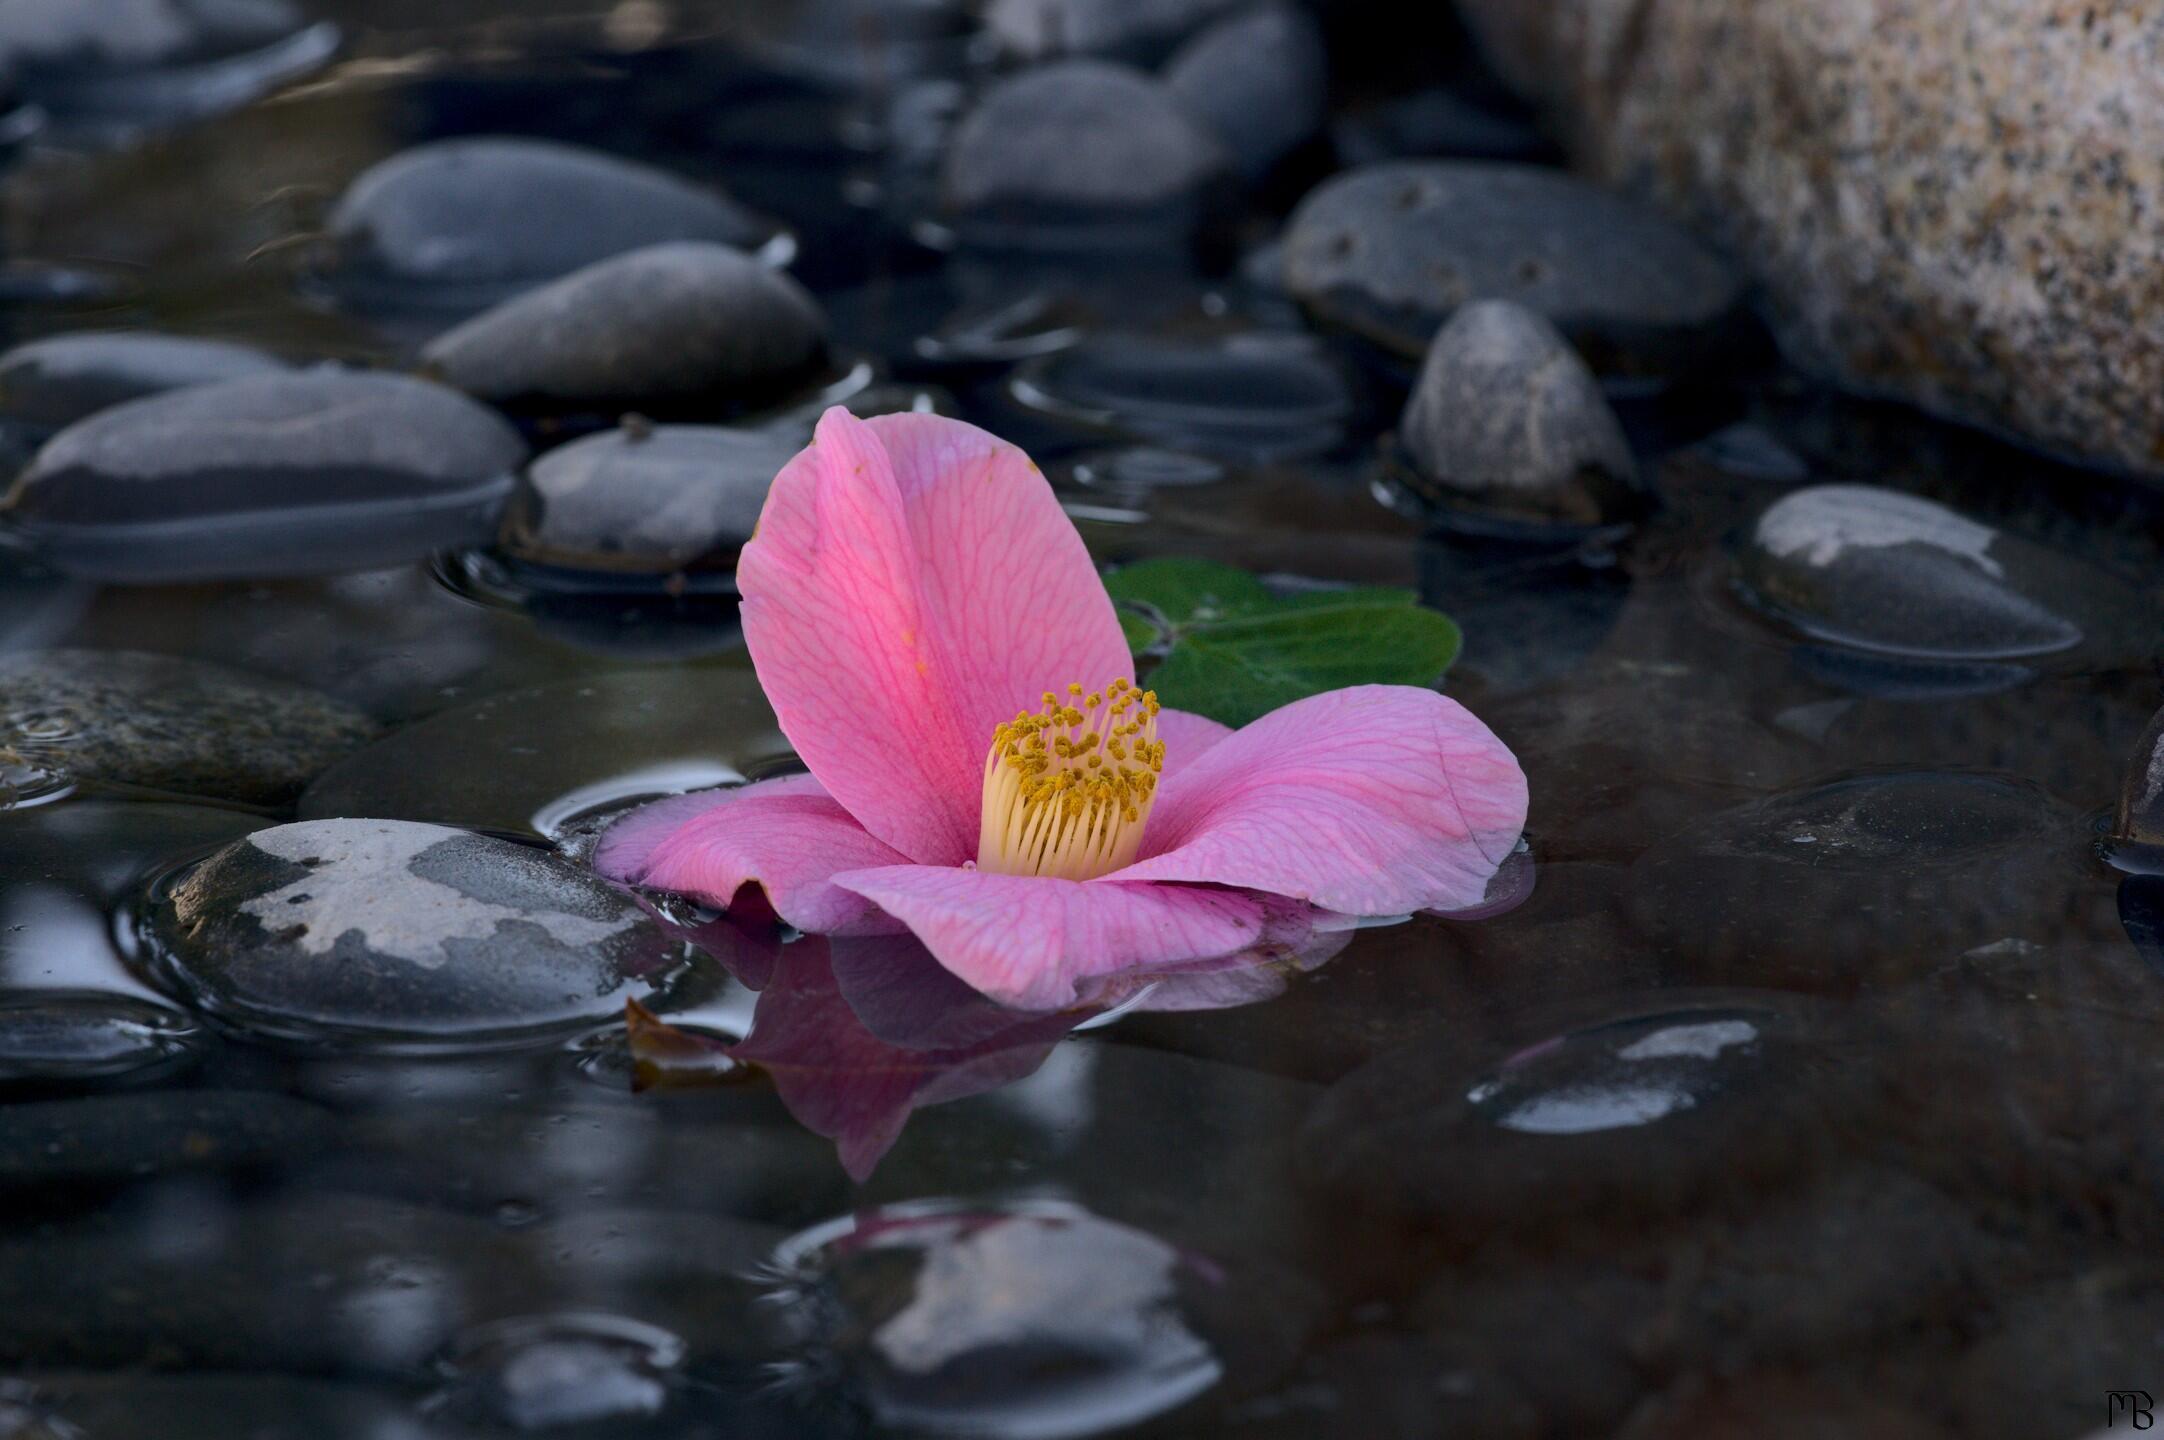 Pink flower, floating in water